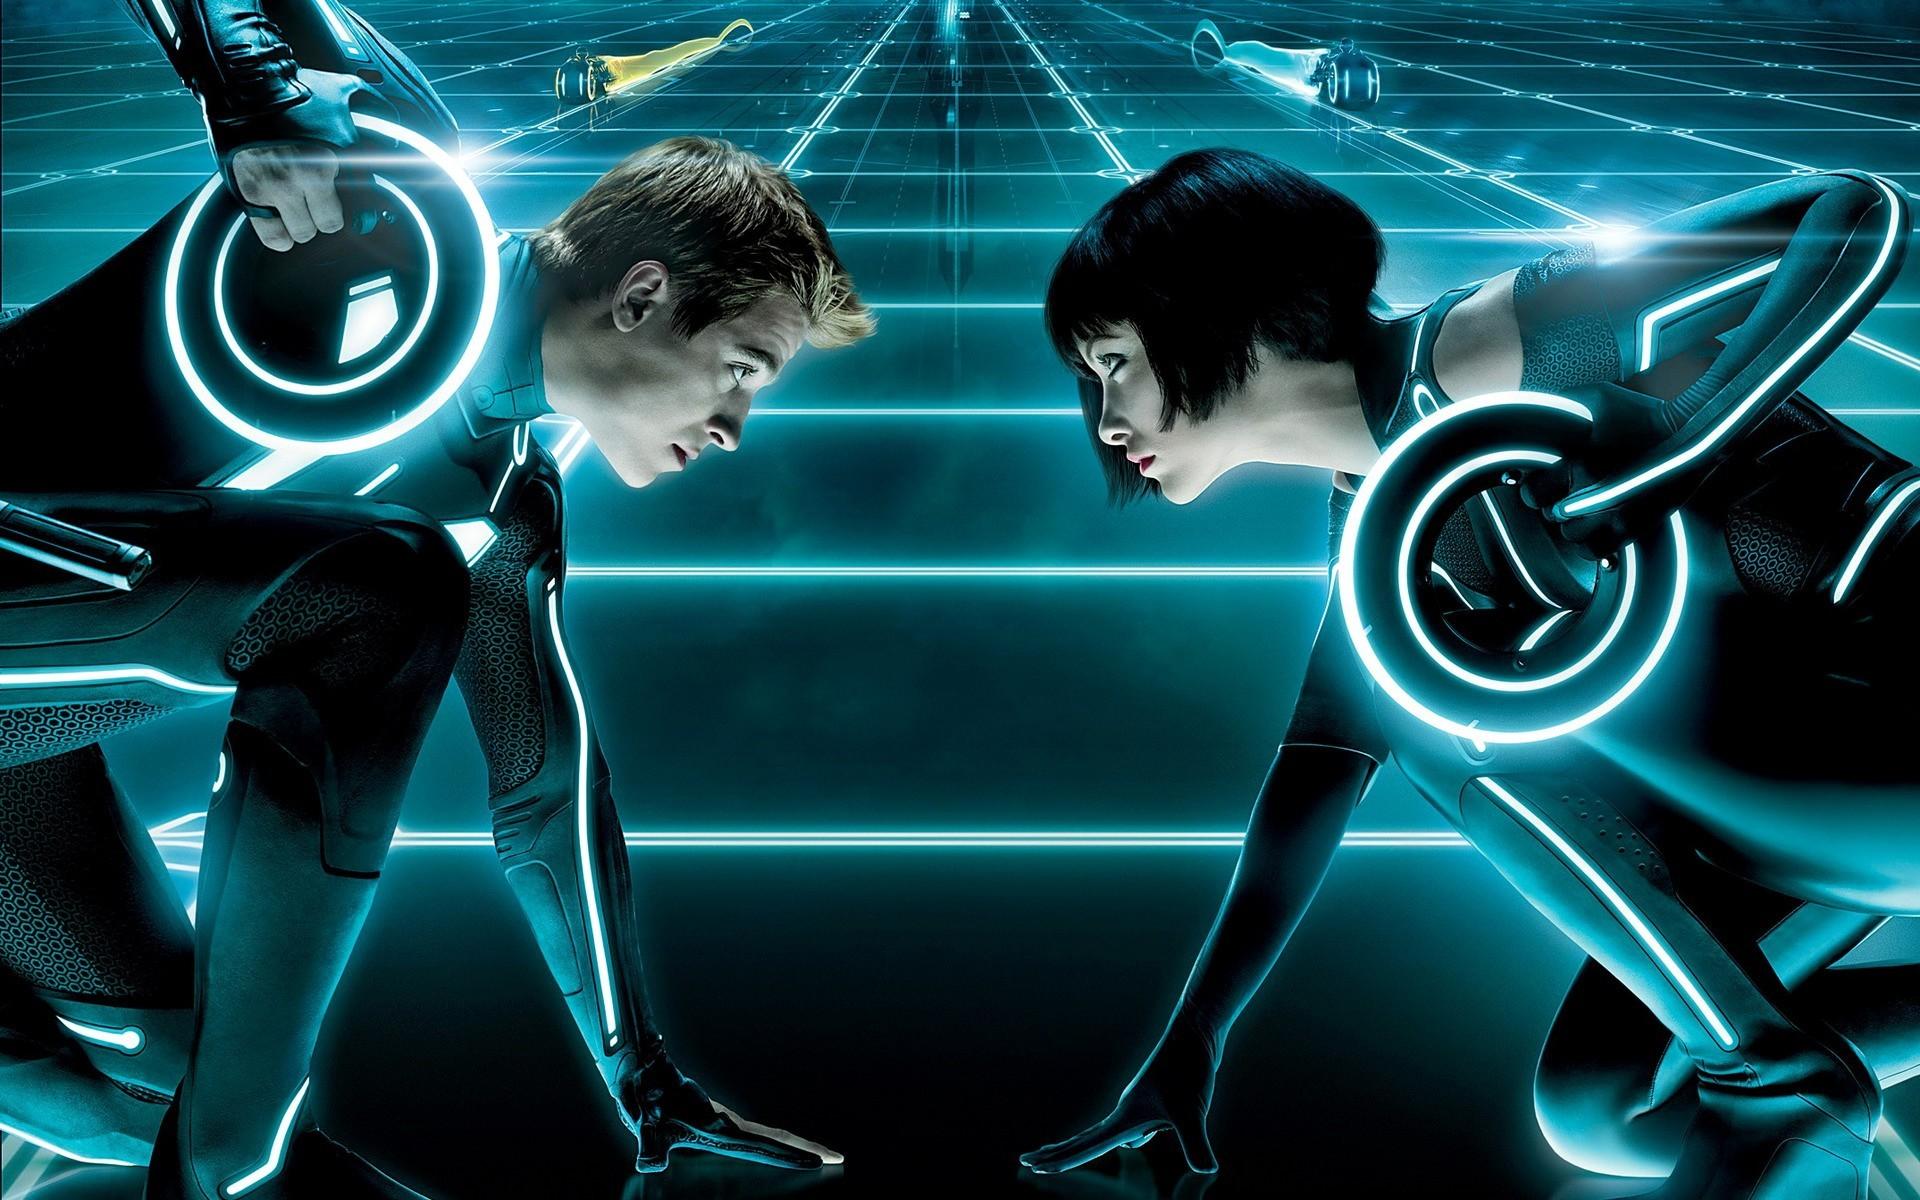 Movie – TRON: Legacy Movie Tron Futuristic Sci Fi Quorra (Tron) Garrett  Hedlund